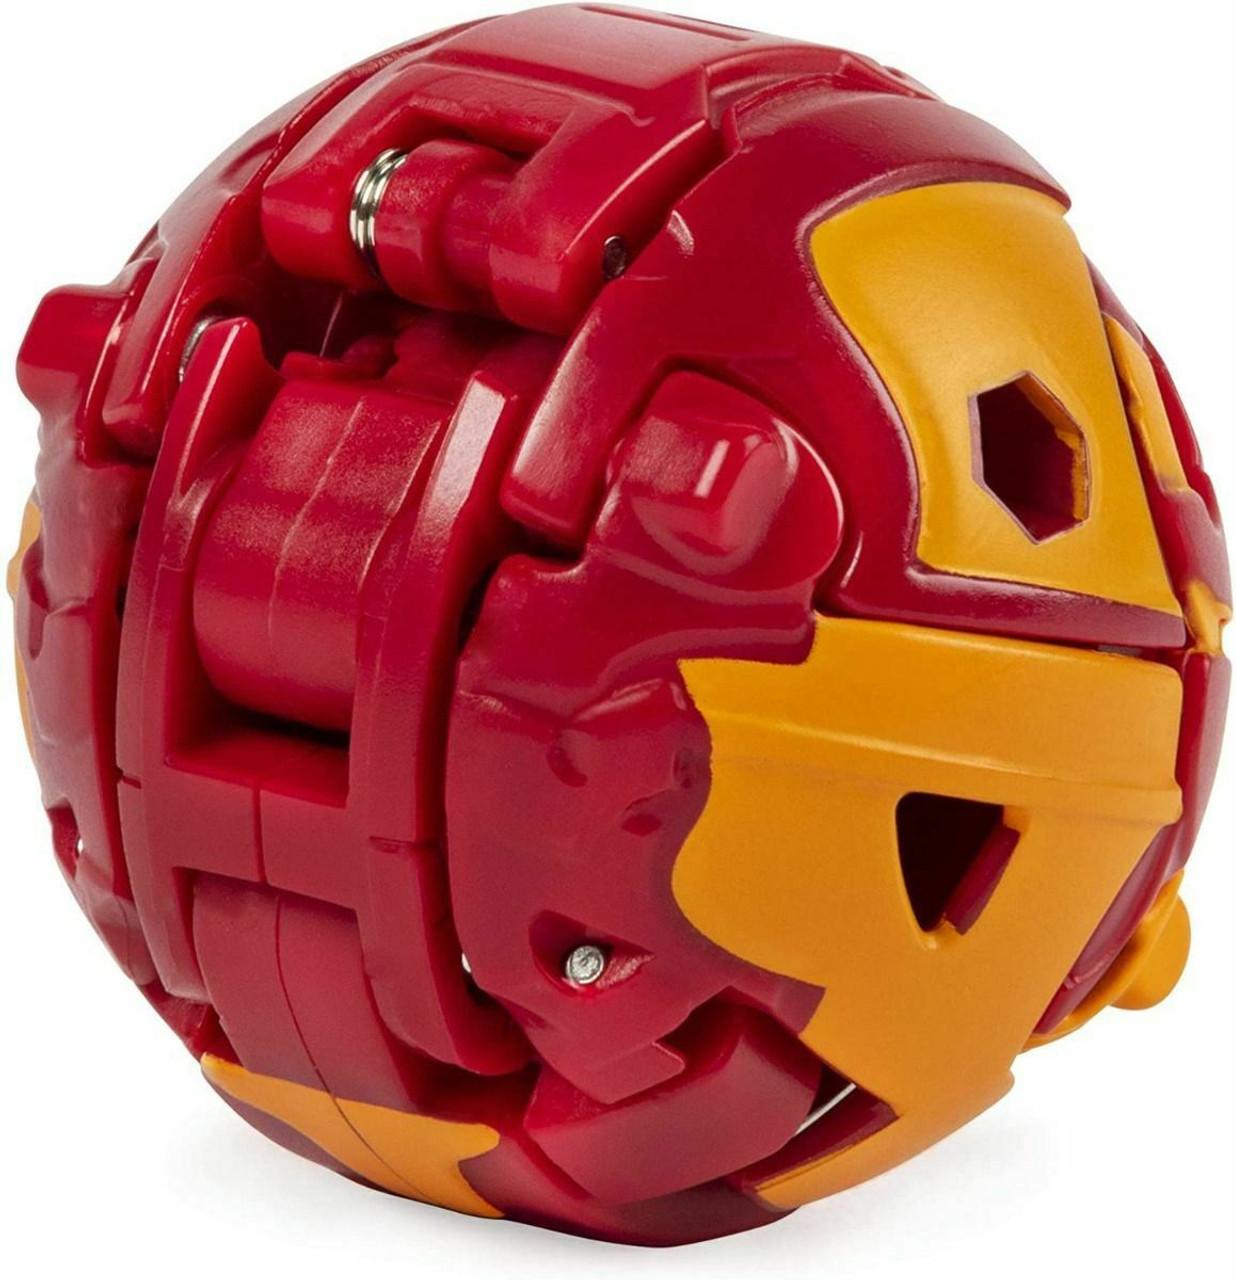 BAKUGAN AA DX GEAR BAKU BALL 37A DRAGONOID RED